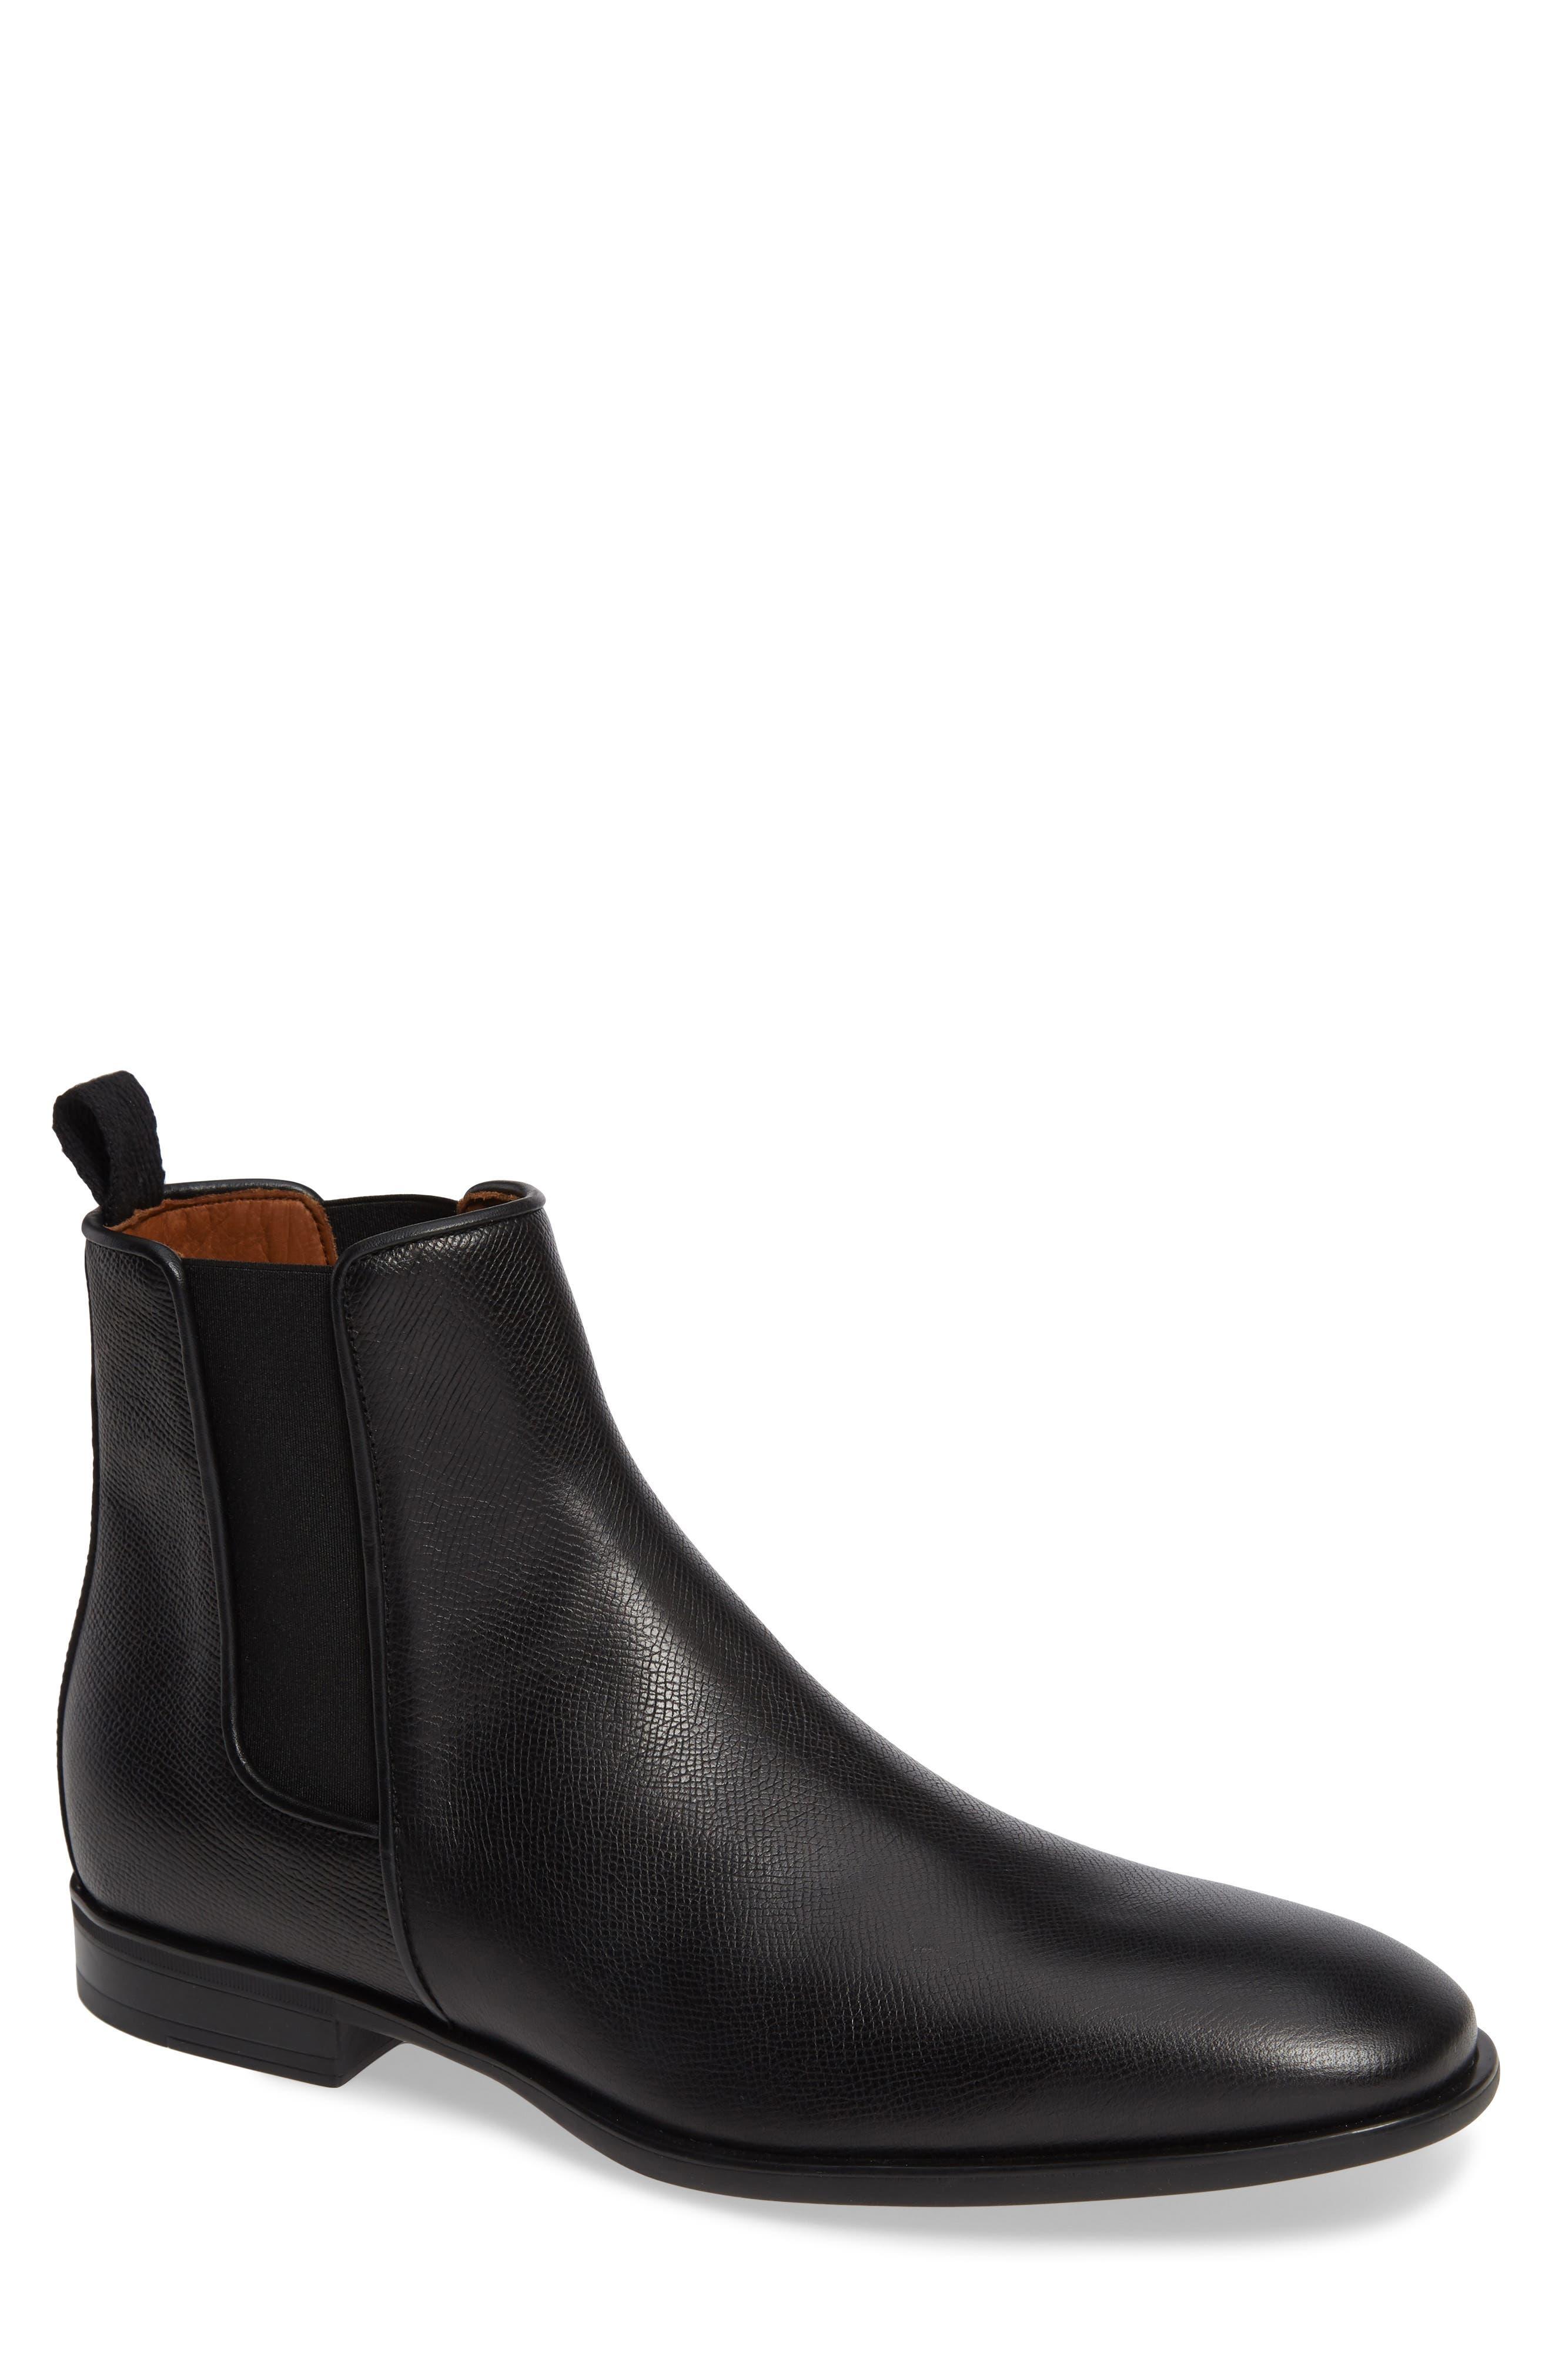 AQUATALIA 'Adrian' Water Resistant Chelsea Boot, Main, color, BLACK/ BLACK